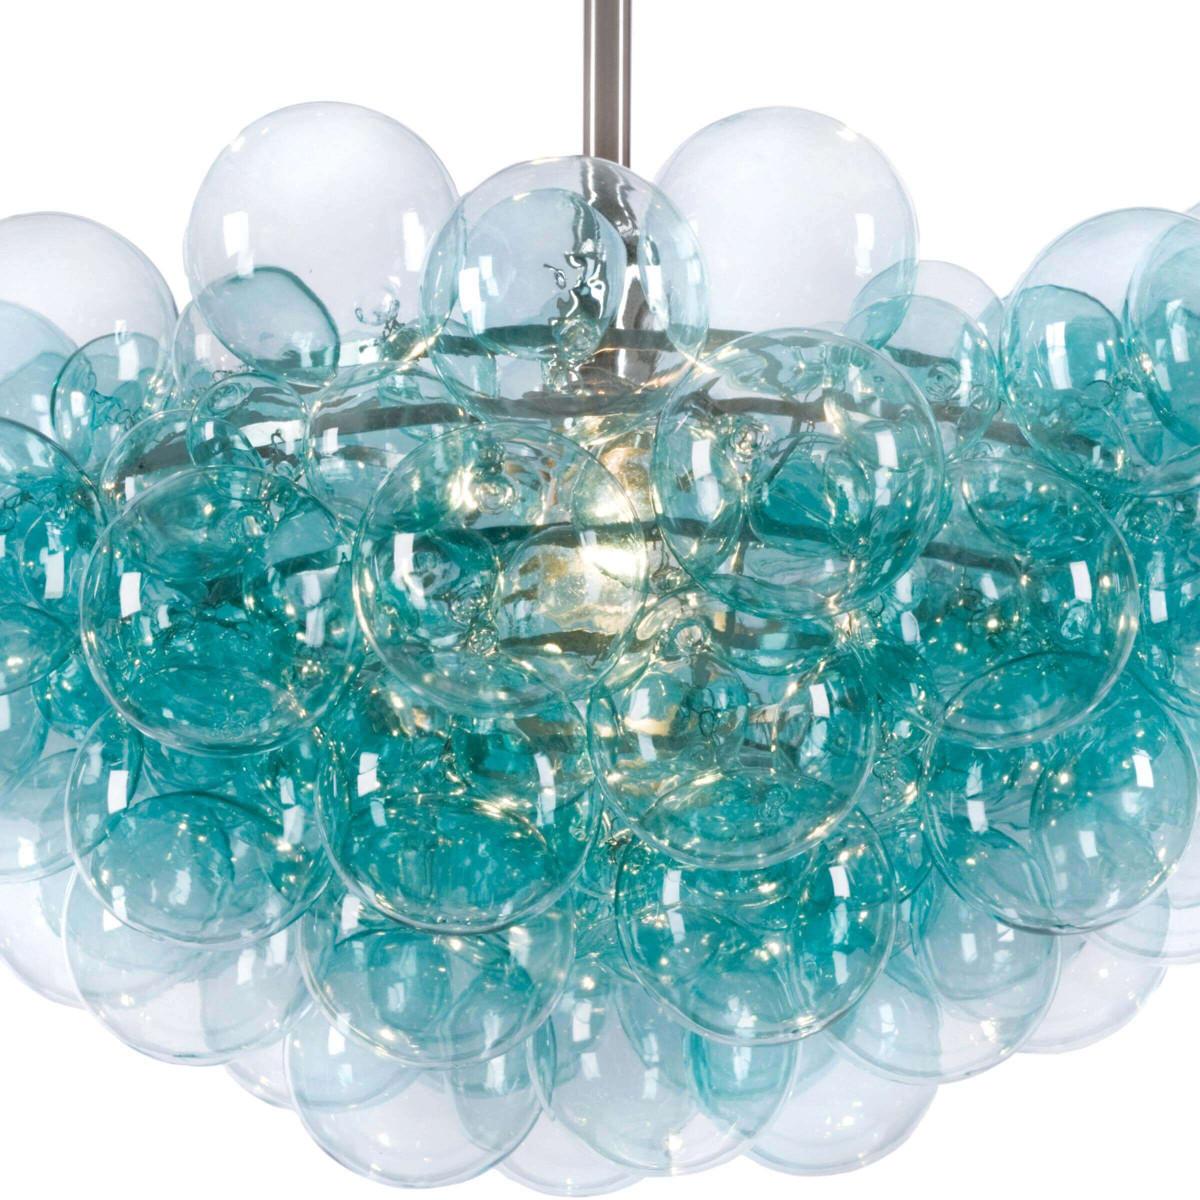 Bolle Glass Globes Chandelier | Aqua & Nickel